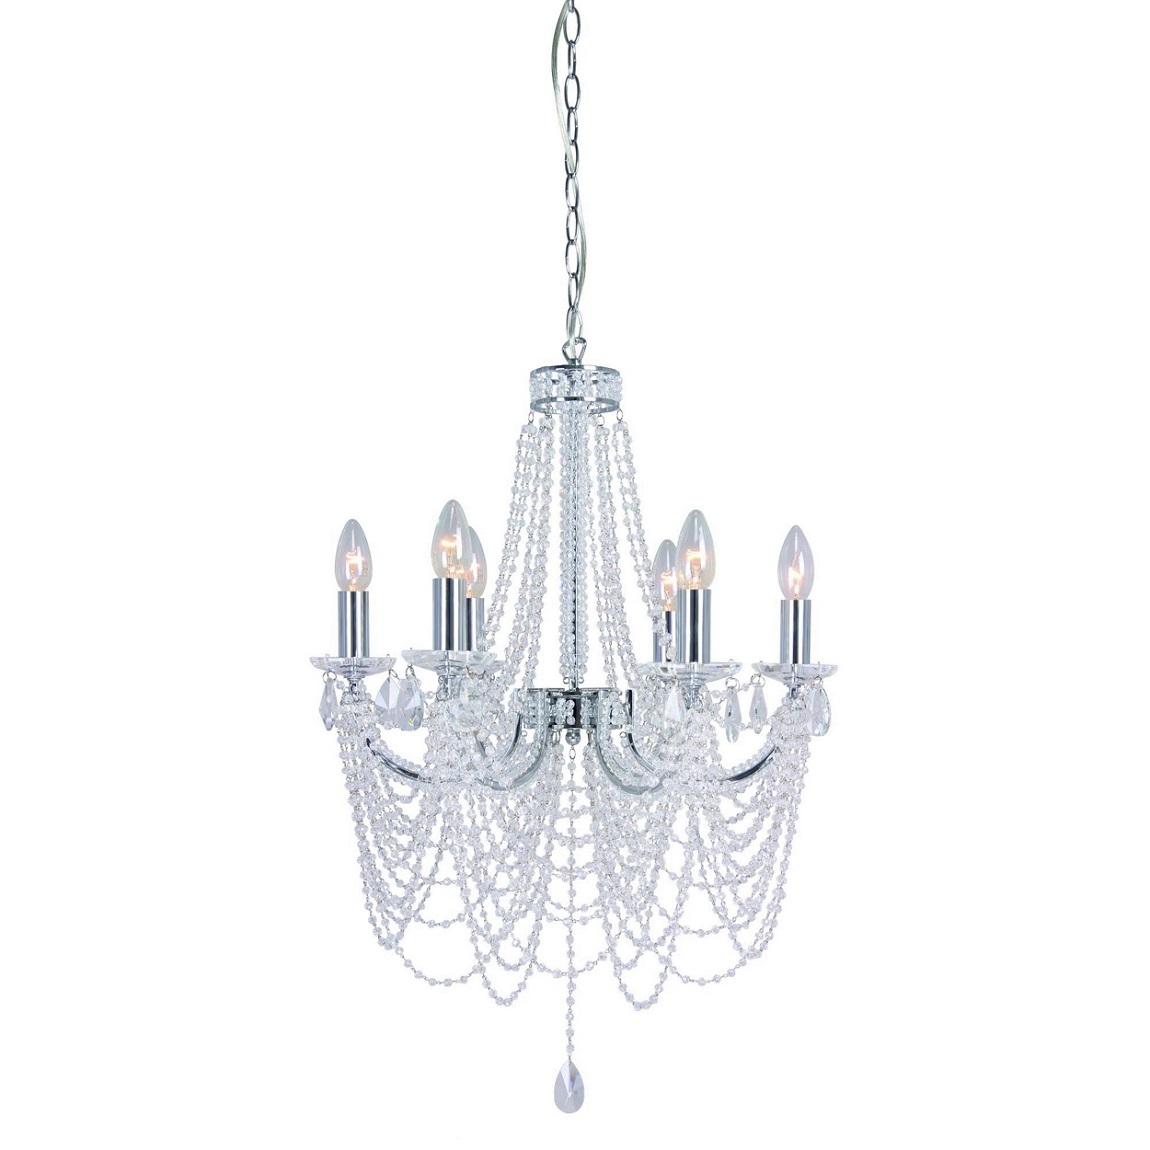 Debenhams Home Collection Evelyn Chandelier Ceiling Light